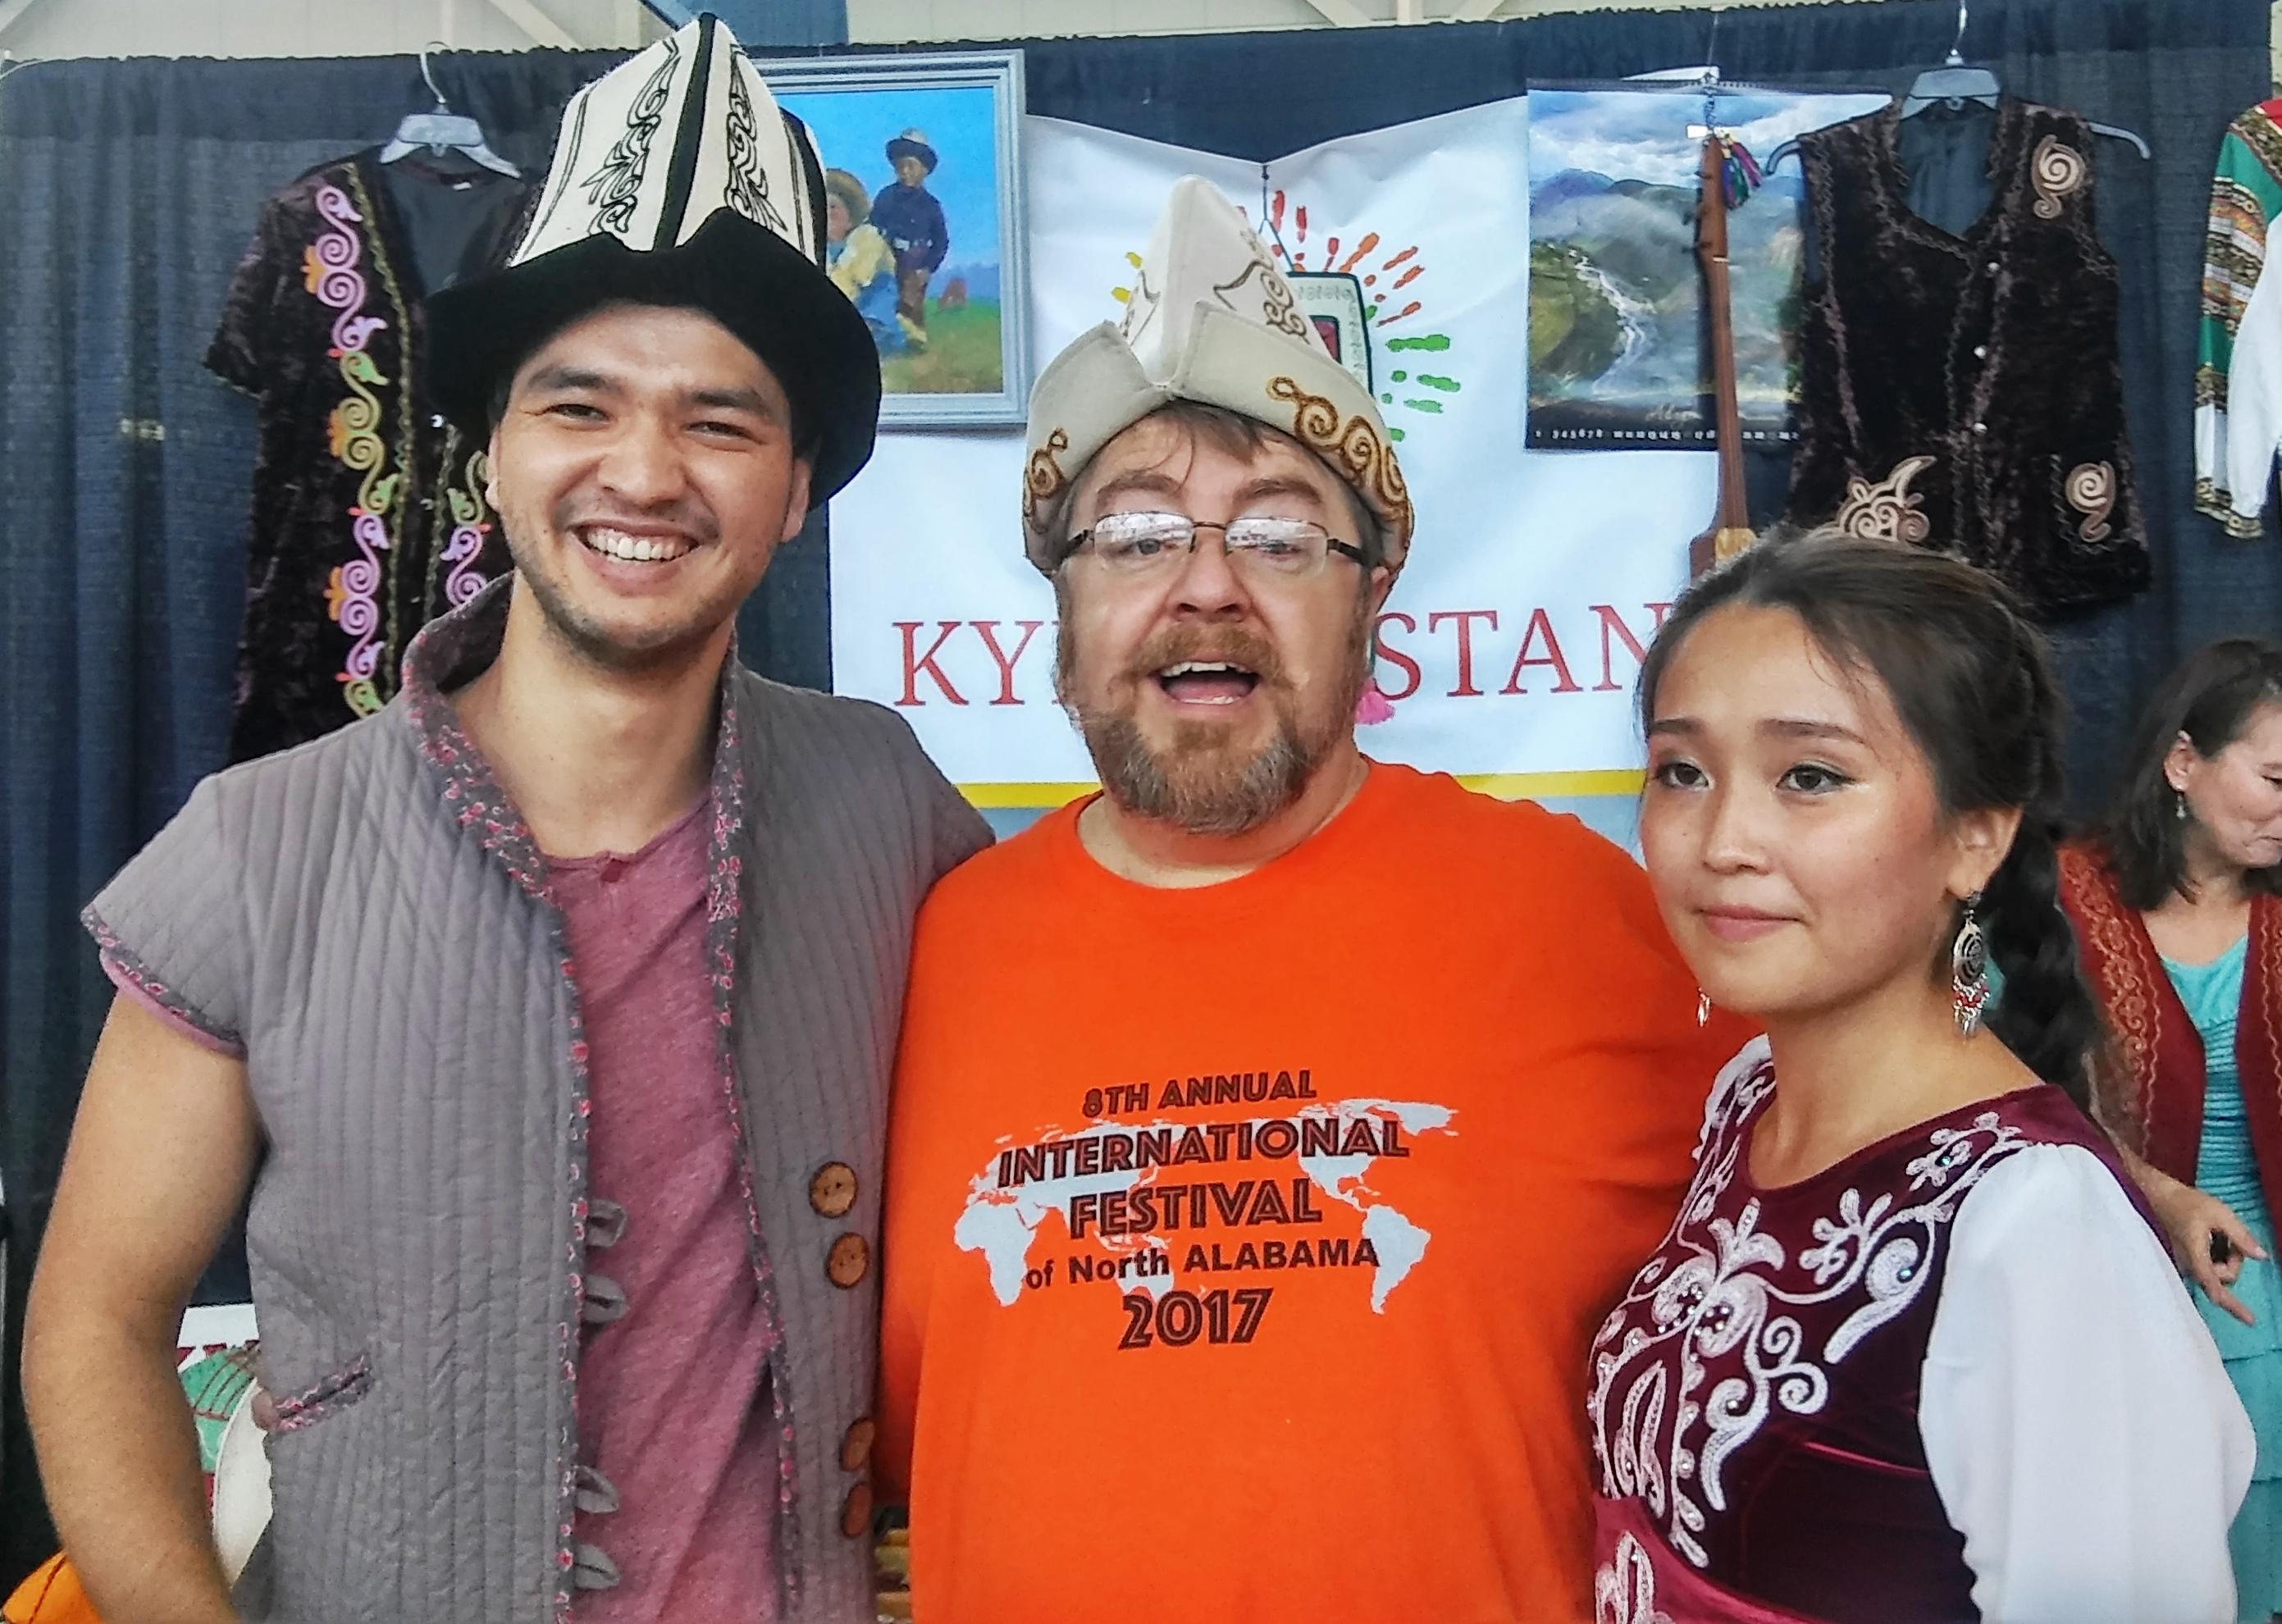 https://alabama-travel.s3.amazonaws.com/partners-uploads/photo/image/5b47ffd8b34b393a540000bd/ifest_2017___kyrgyzstan_2.jpg